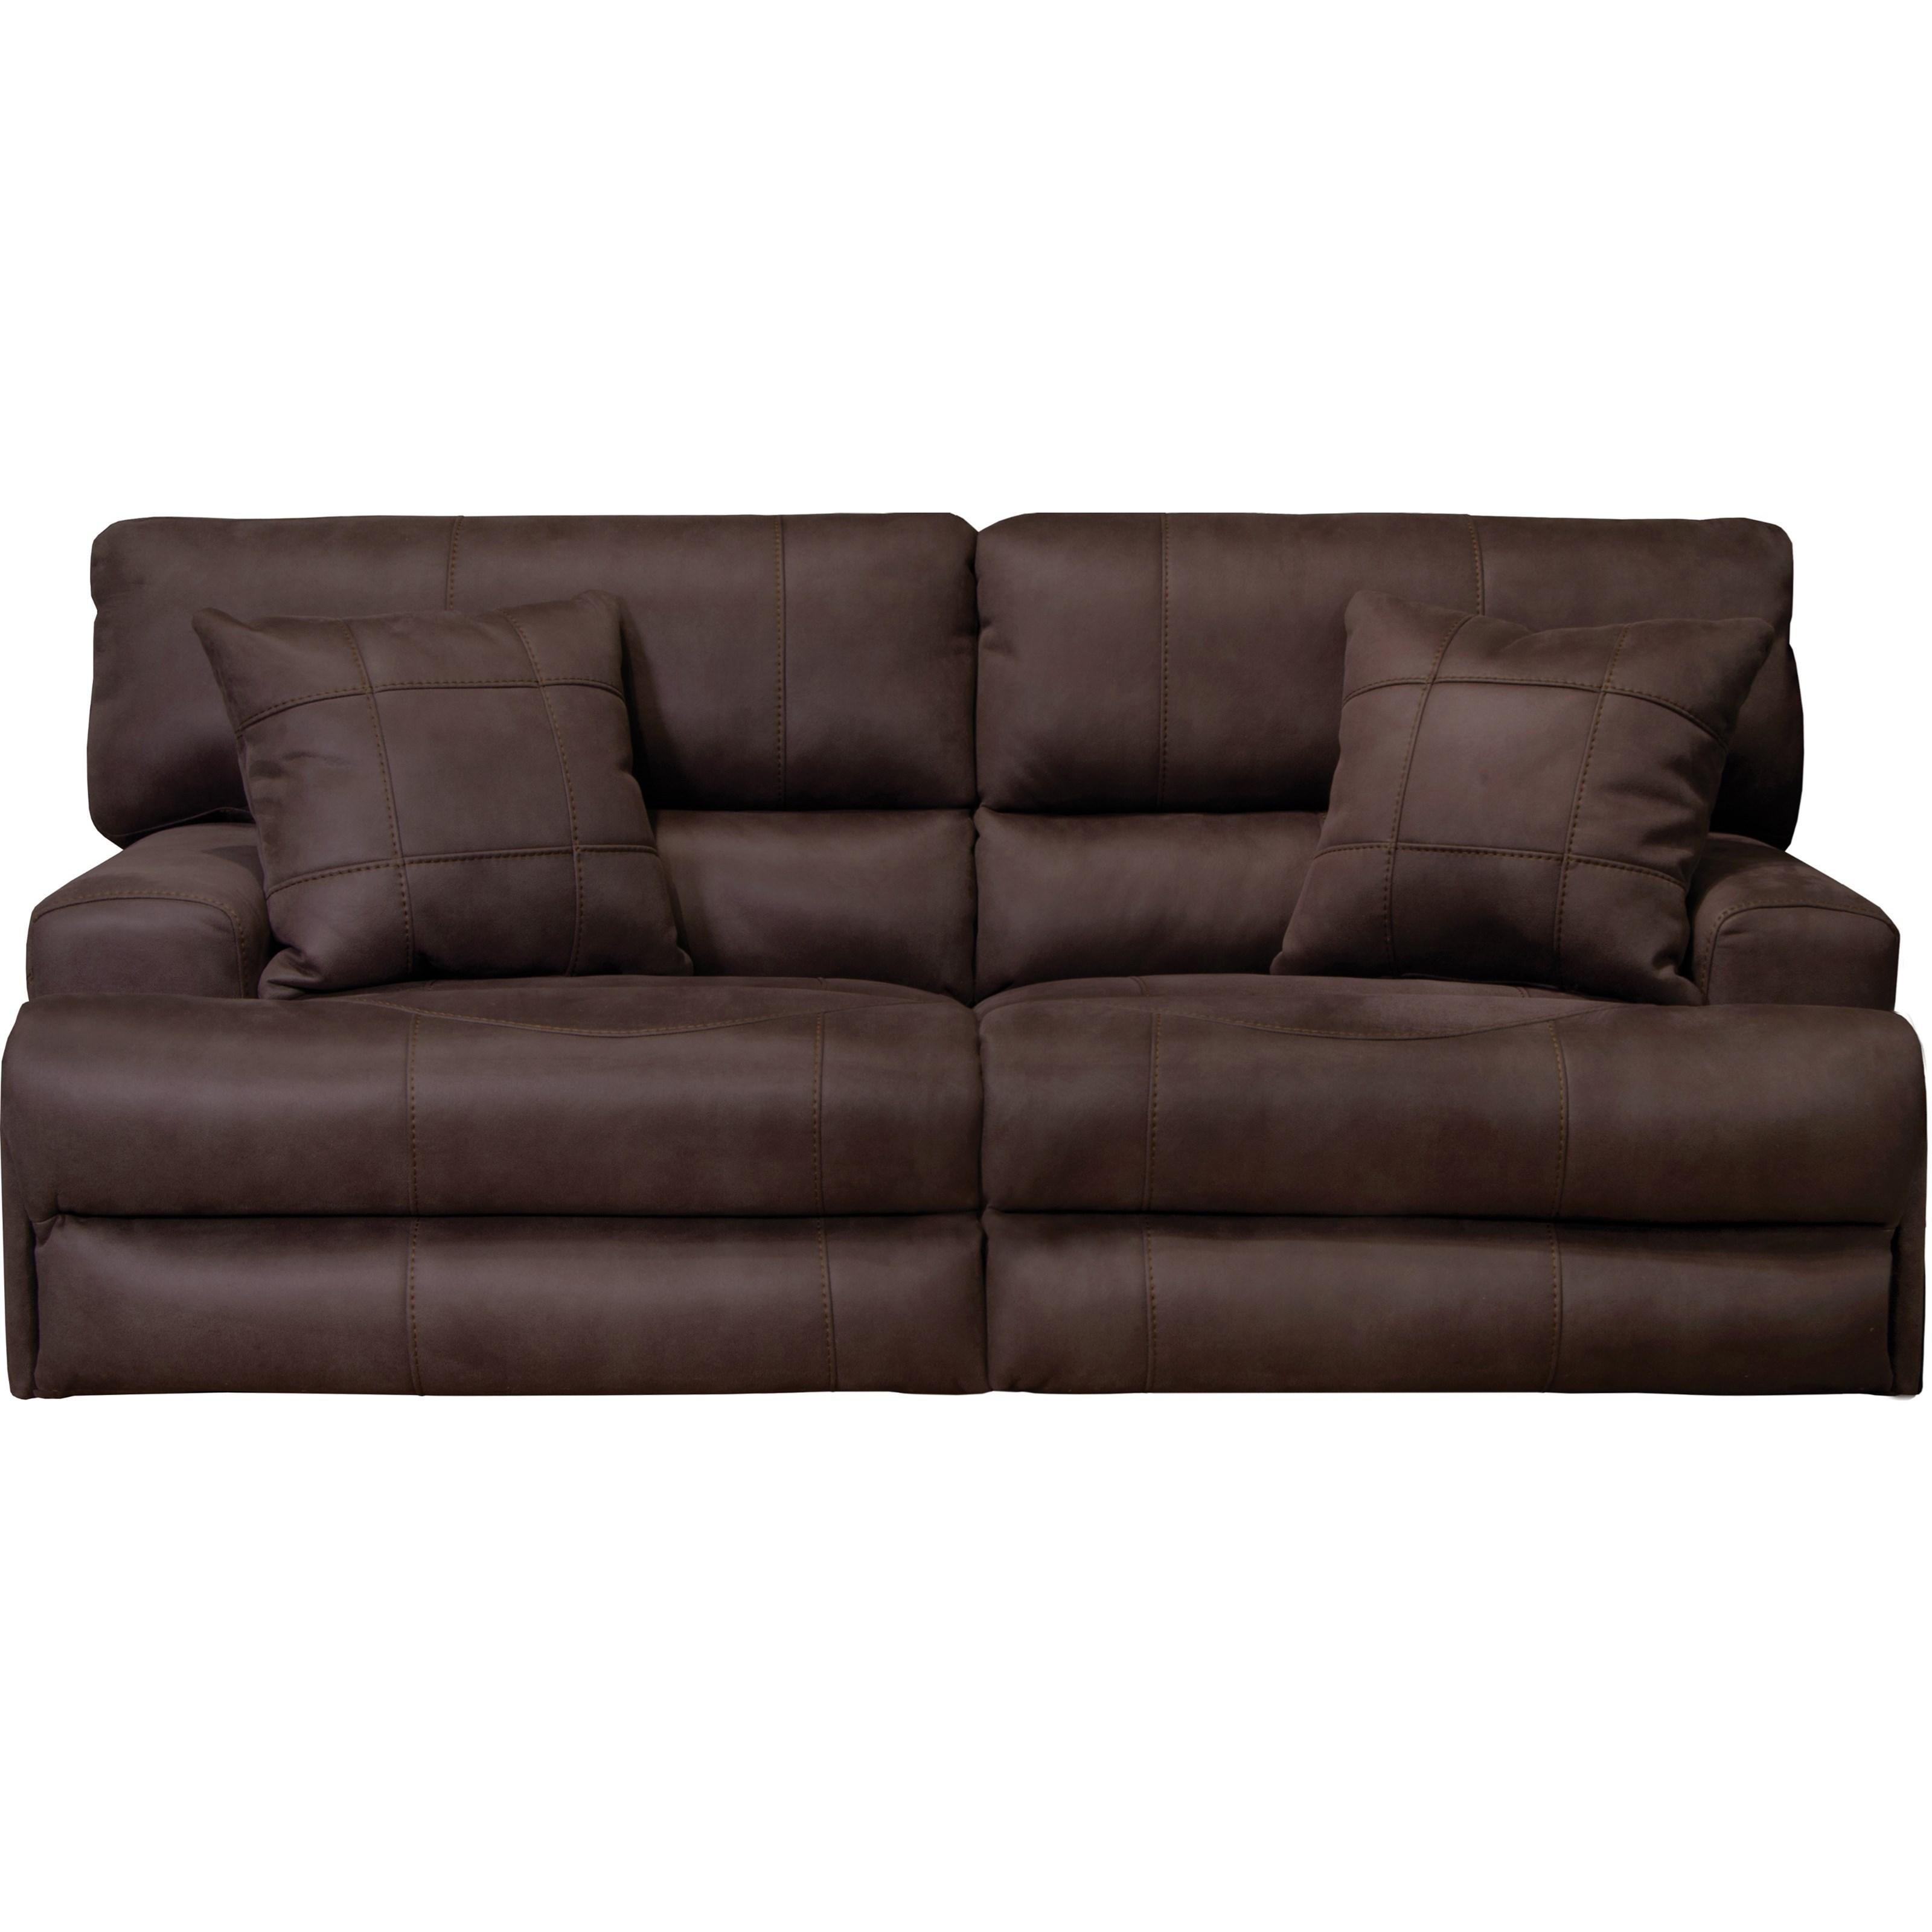 catnapper sofa indian fabric monaco power headrest lay flat reclining